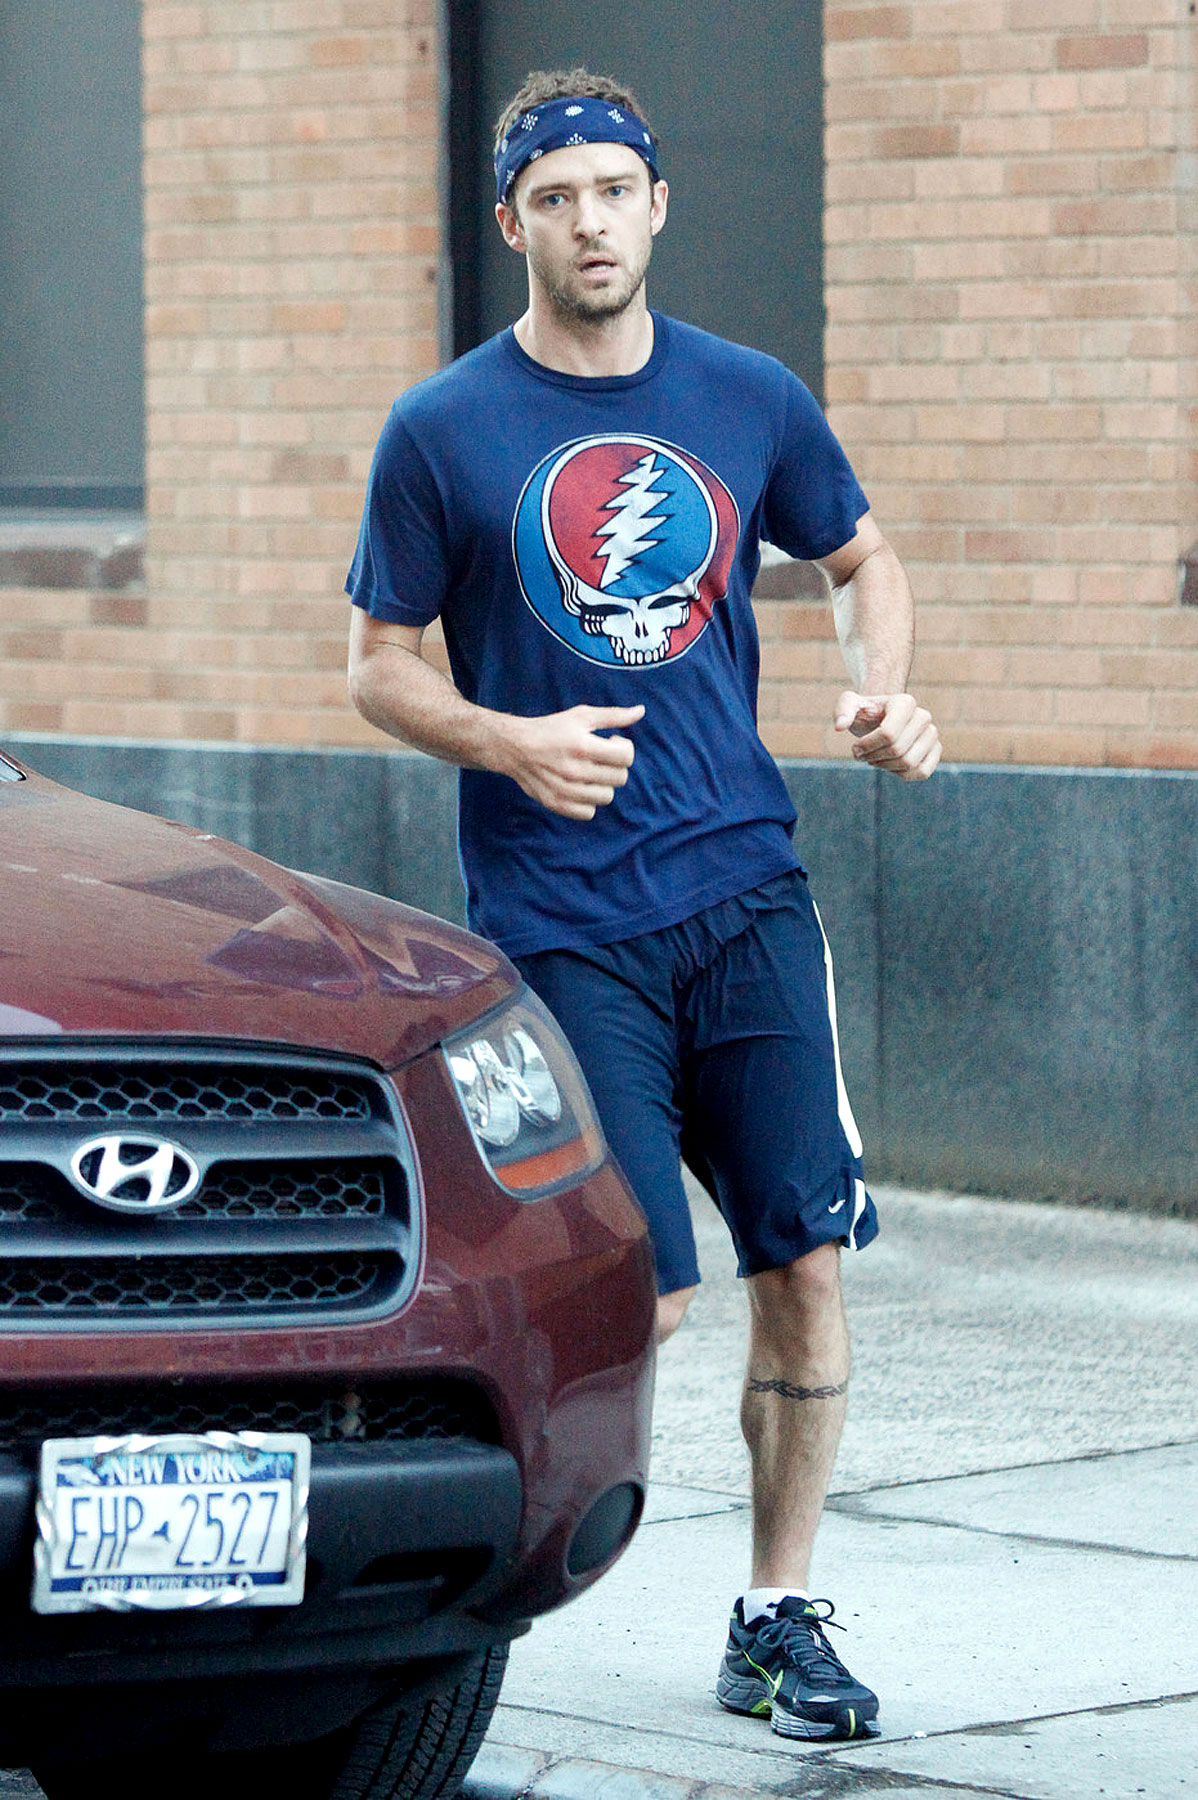 Justin Timberlake Takes a Run at Hippie Chic (PHOTOS)